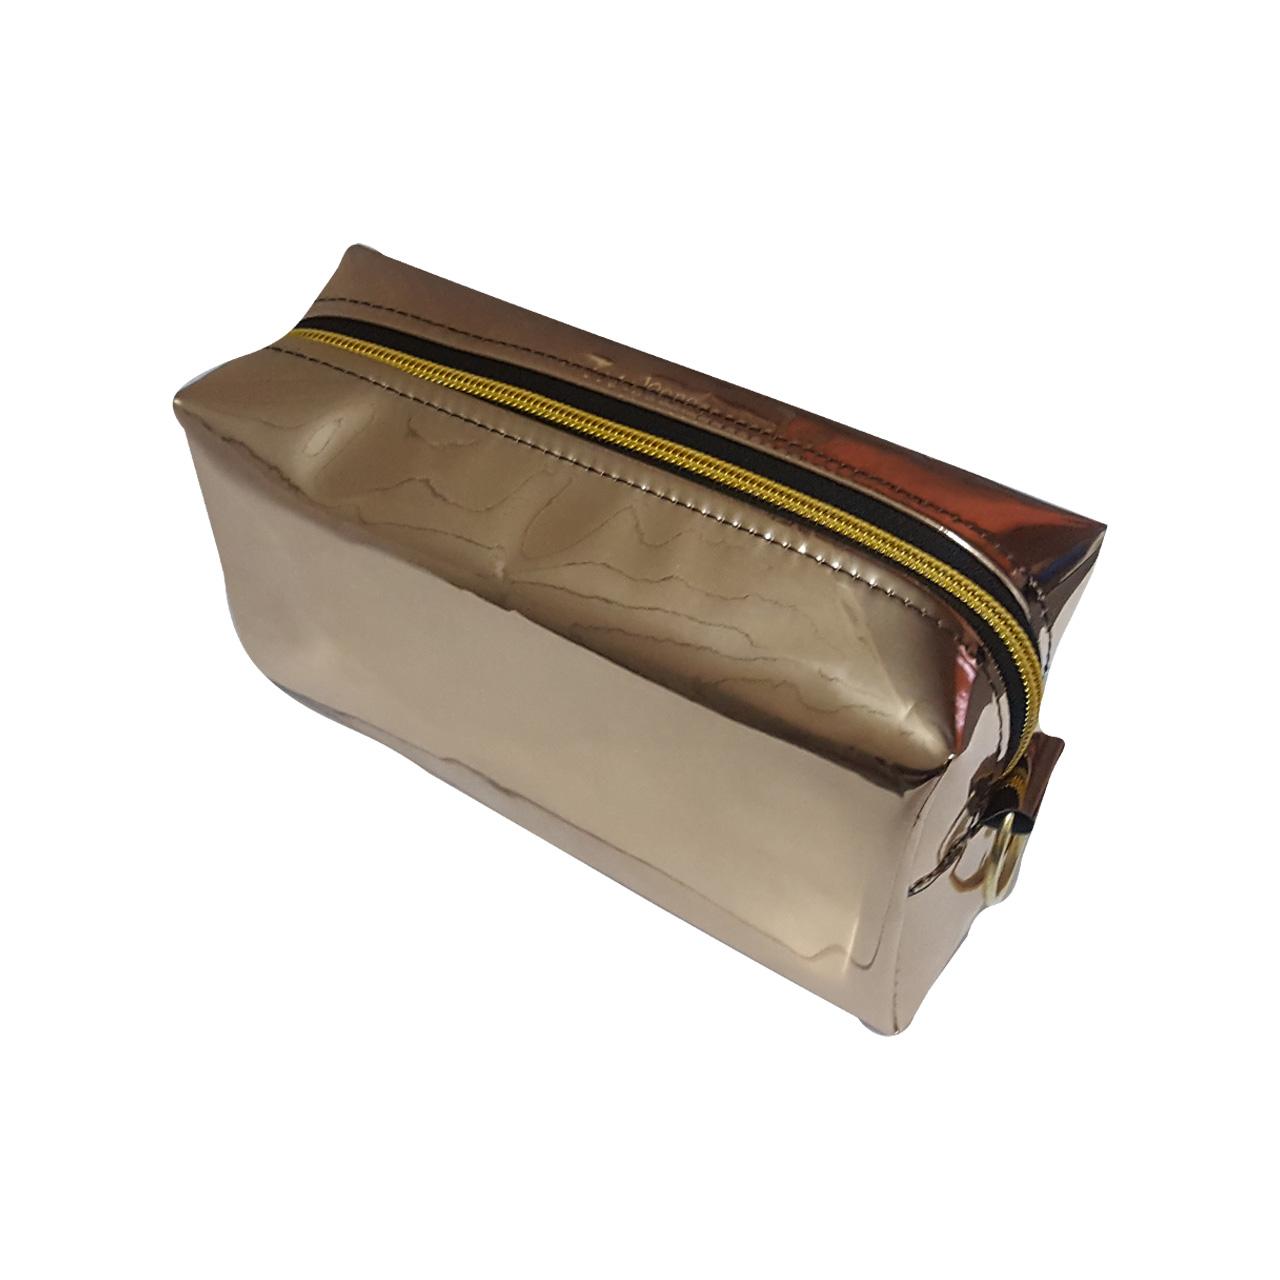 کیف  لوازم  آرایش زنانه کد U100